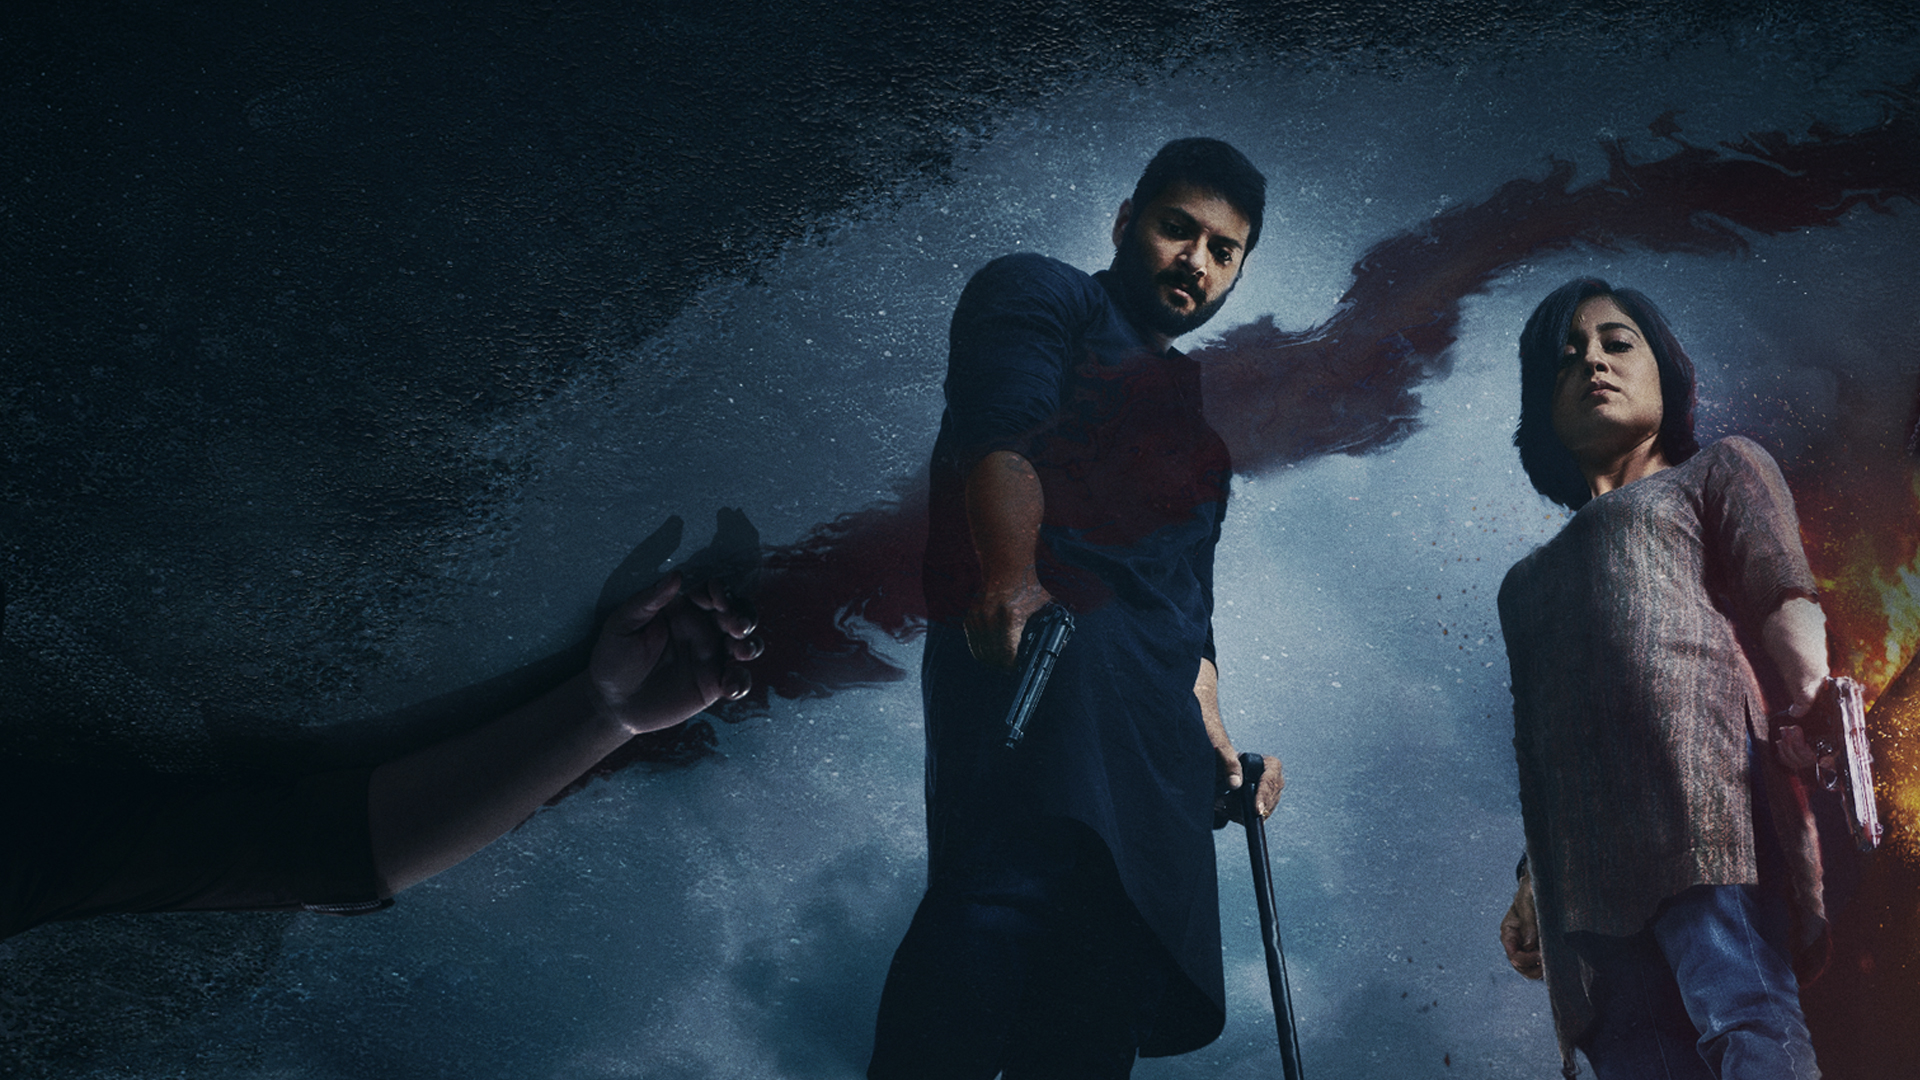 Mirzapur 2 Story, Reviews, trailer, Star cast, release date All Details ttlyblogs.